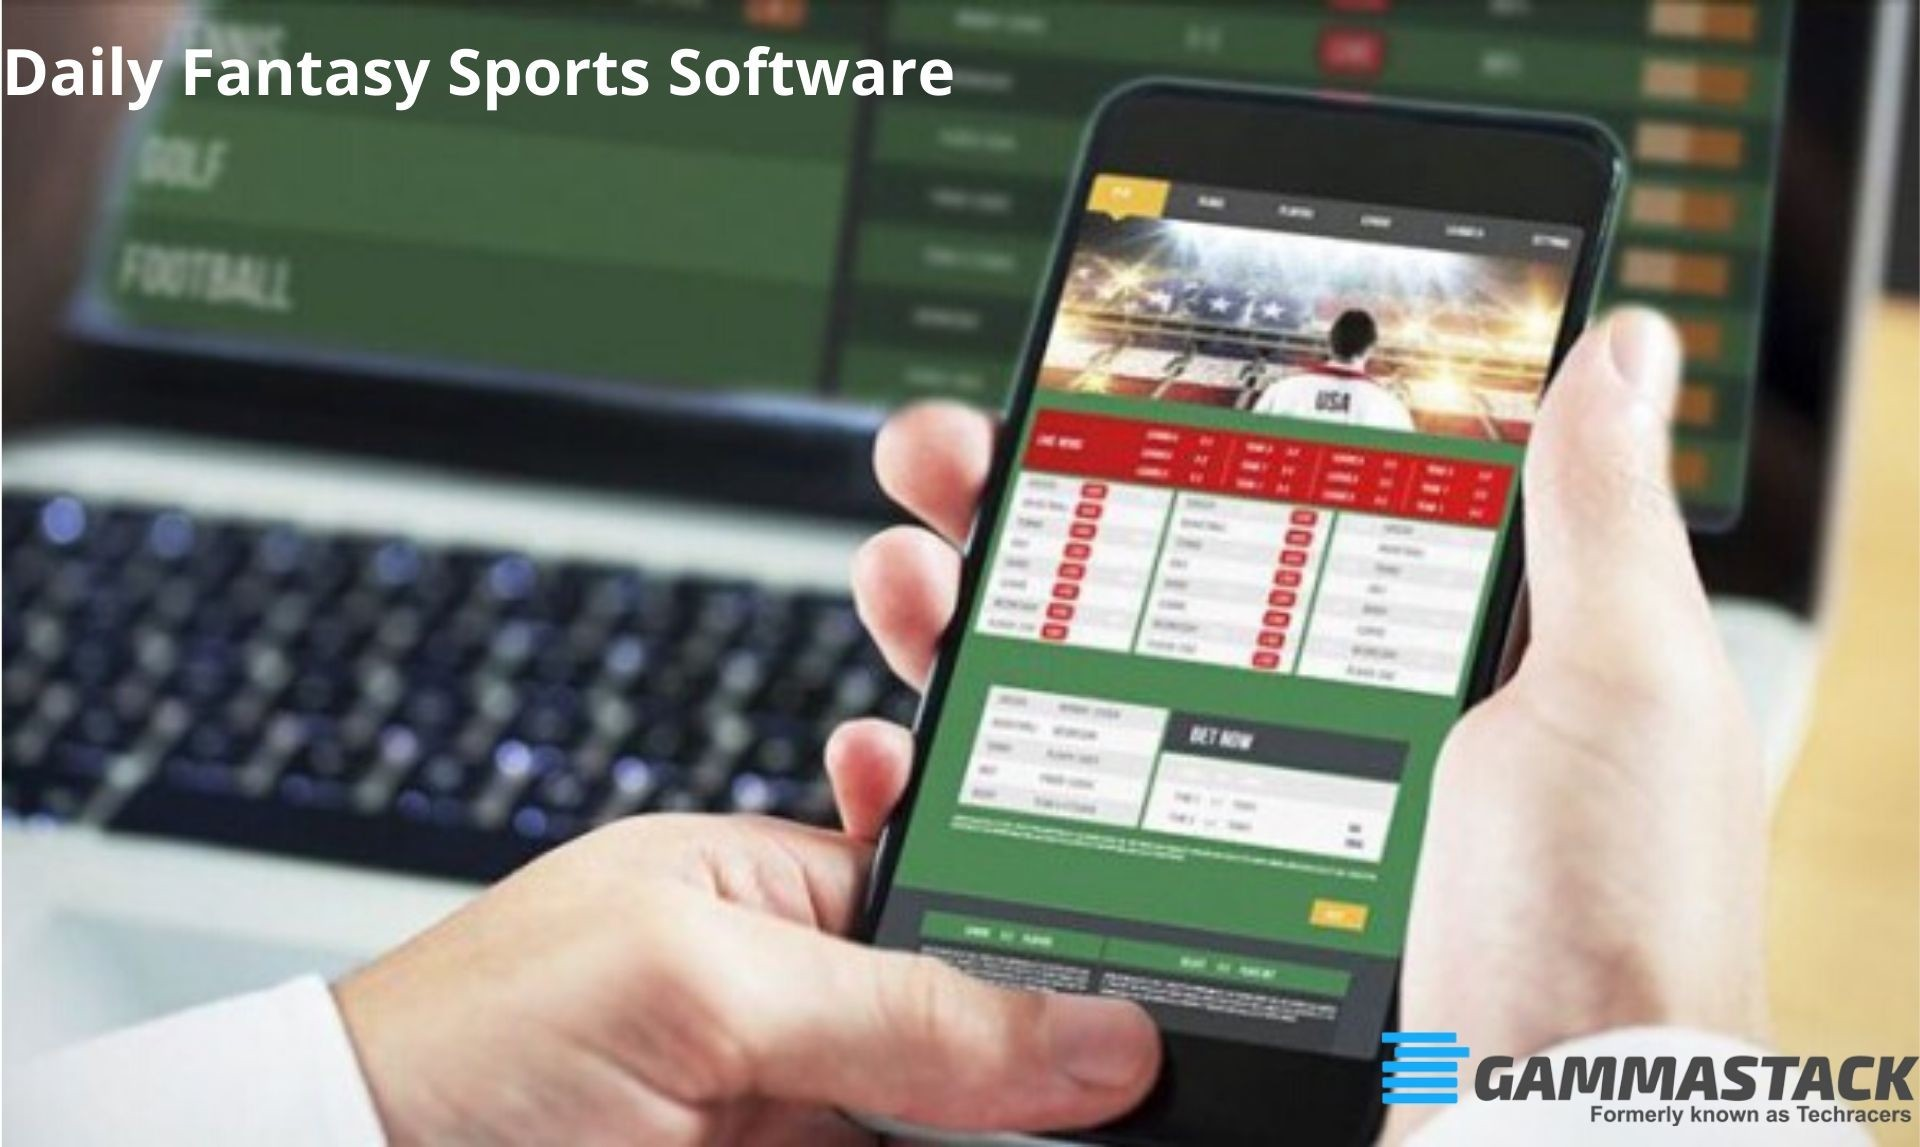 Daily Fantasy Sports Software